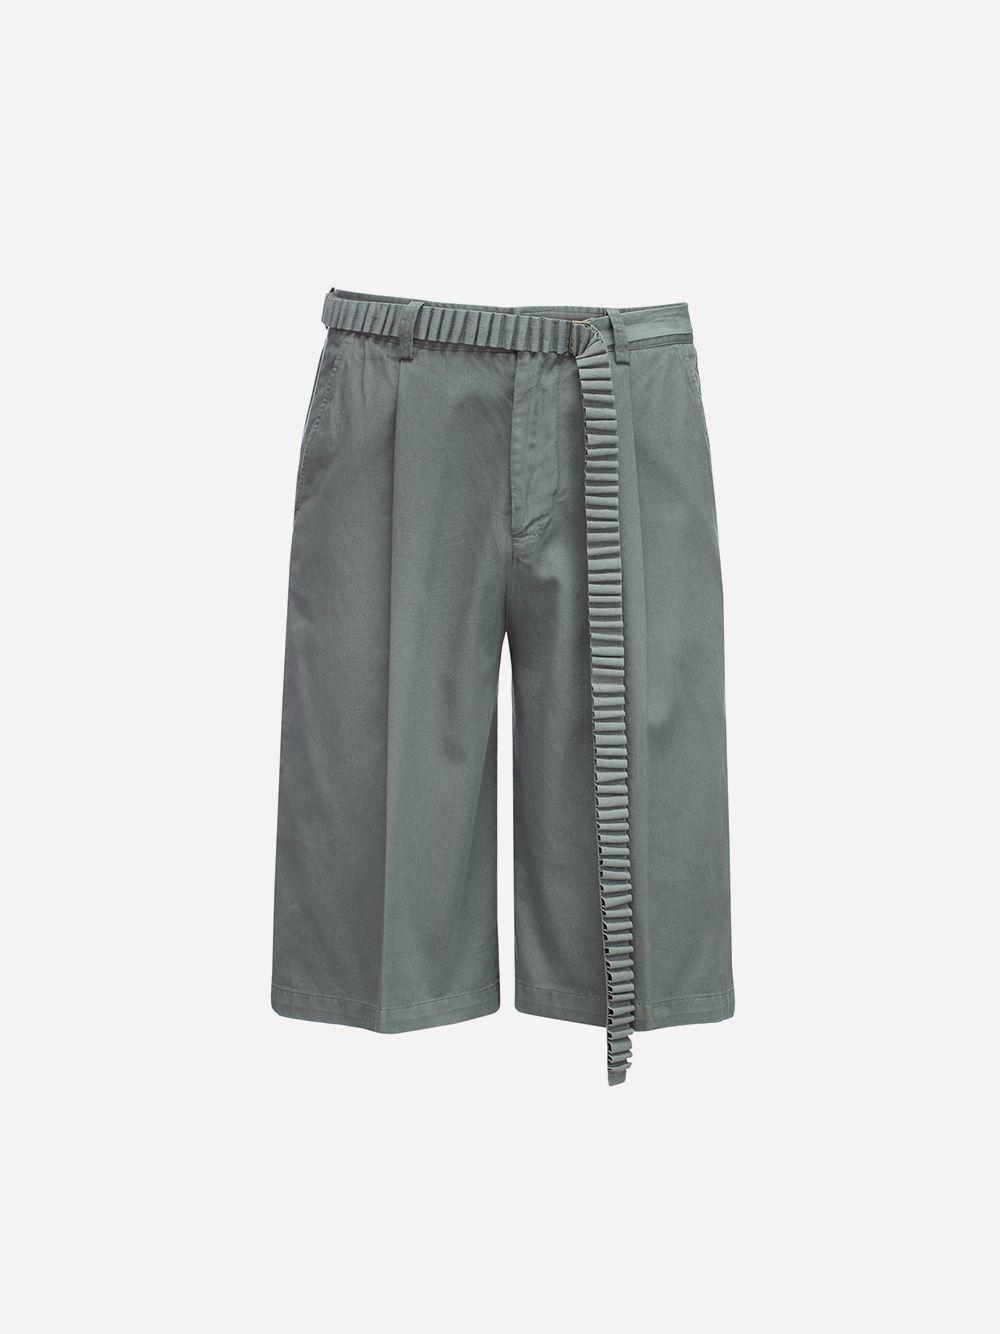 Twill Bermuda Shorts with Belt | Rita Sá